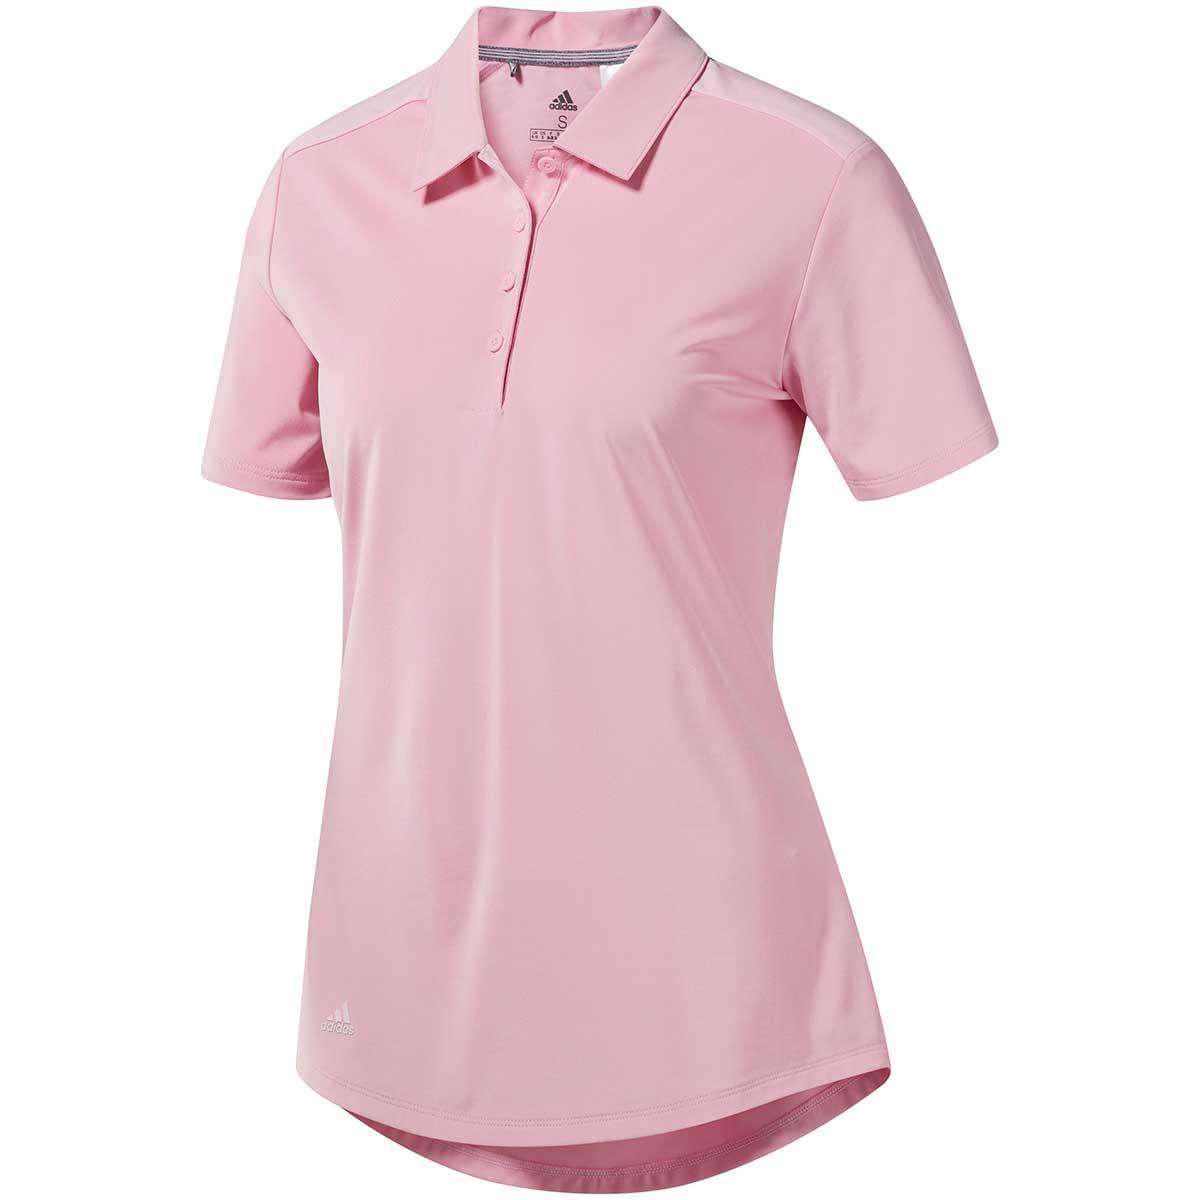 Adidas Women's Ultimate365 Polo Shirt - True Pink